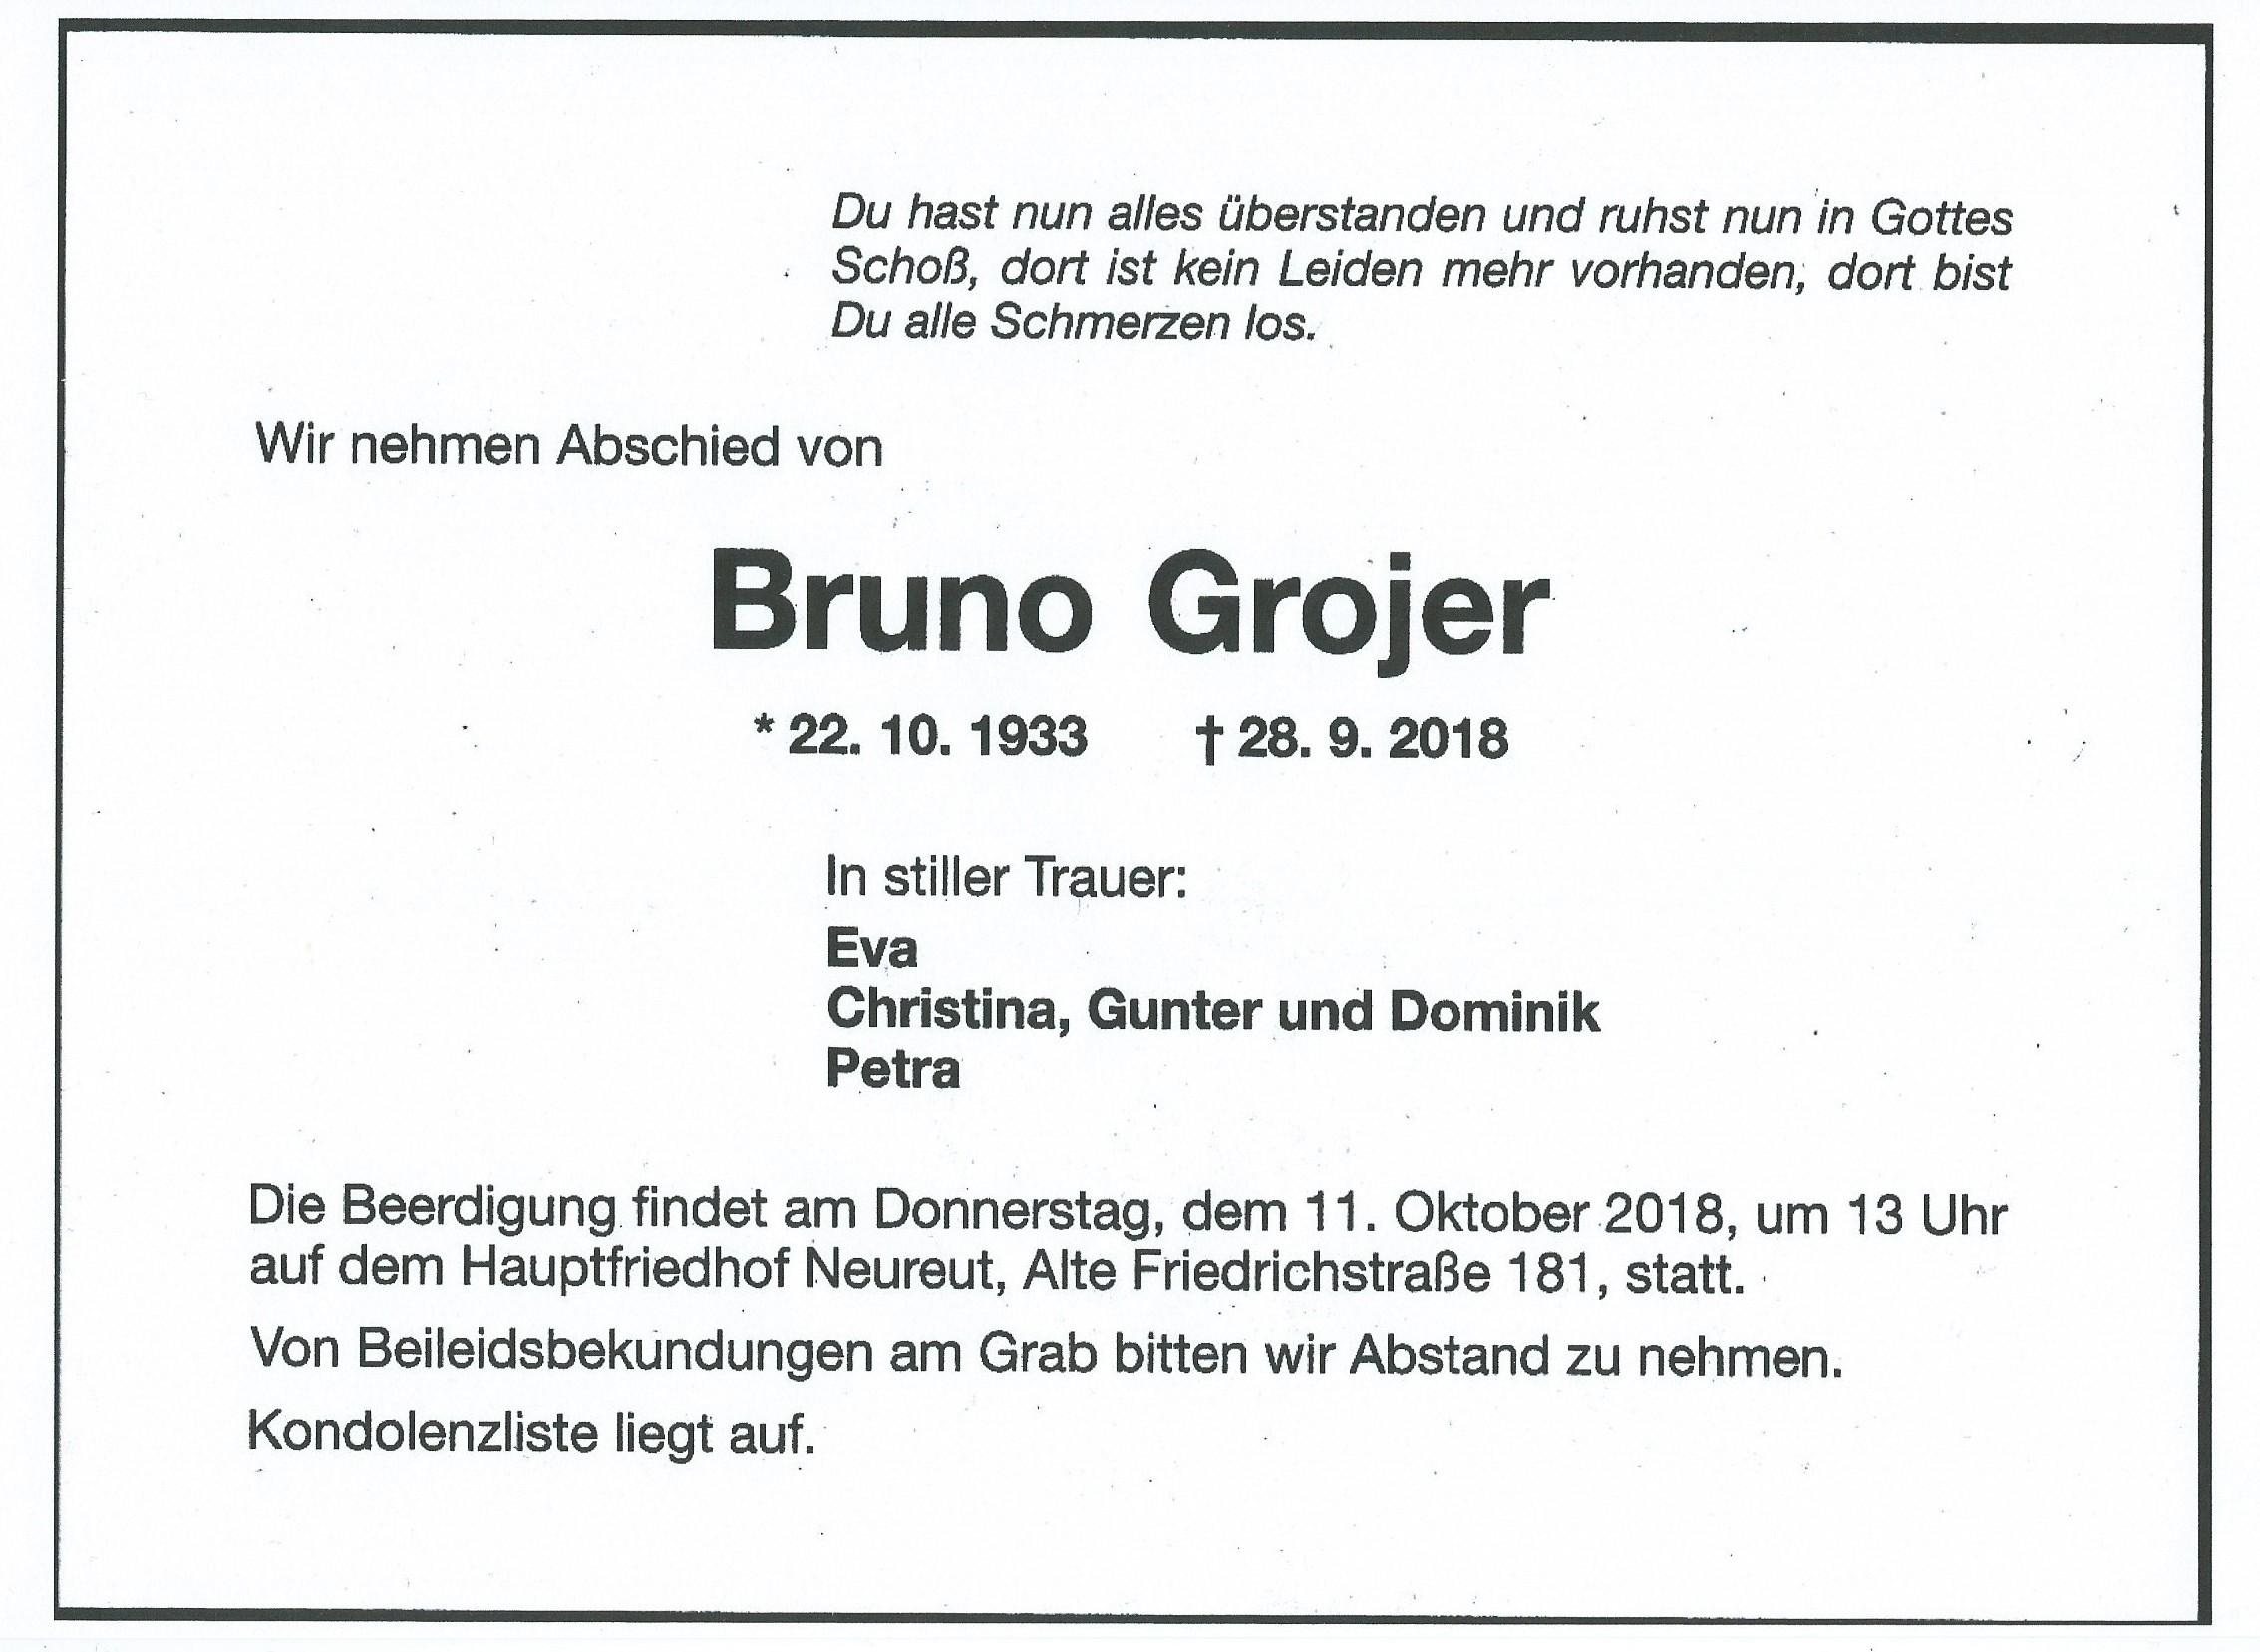 Herr Bruno Grojer War Beim FA Karlsruhe StV Re